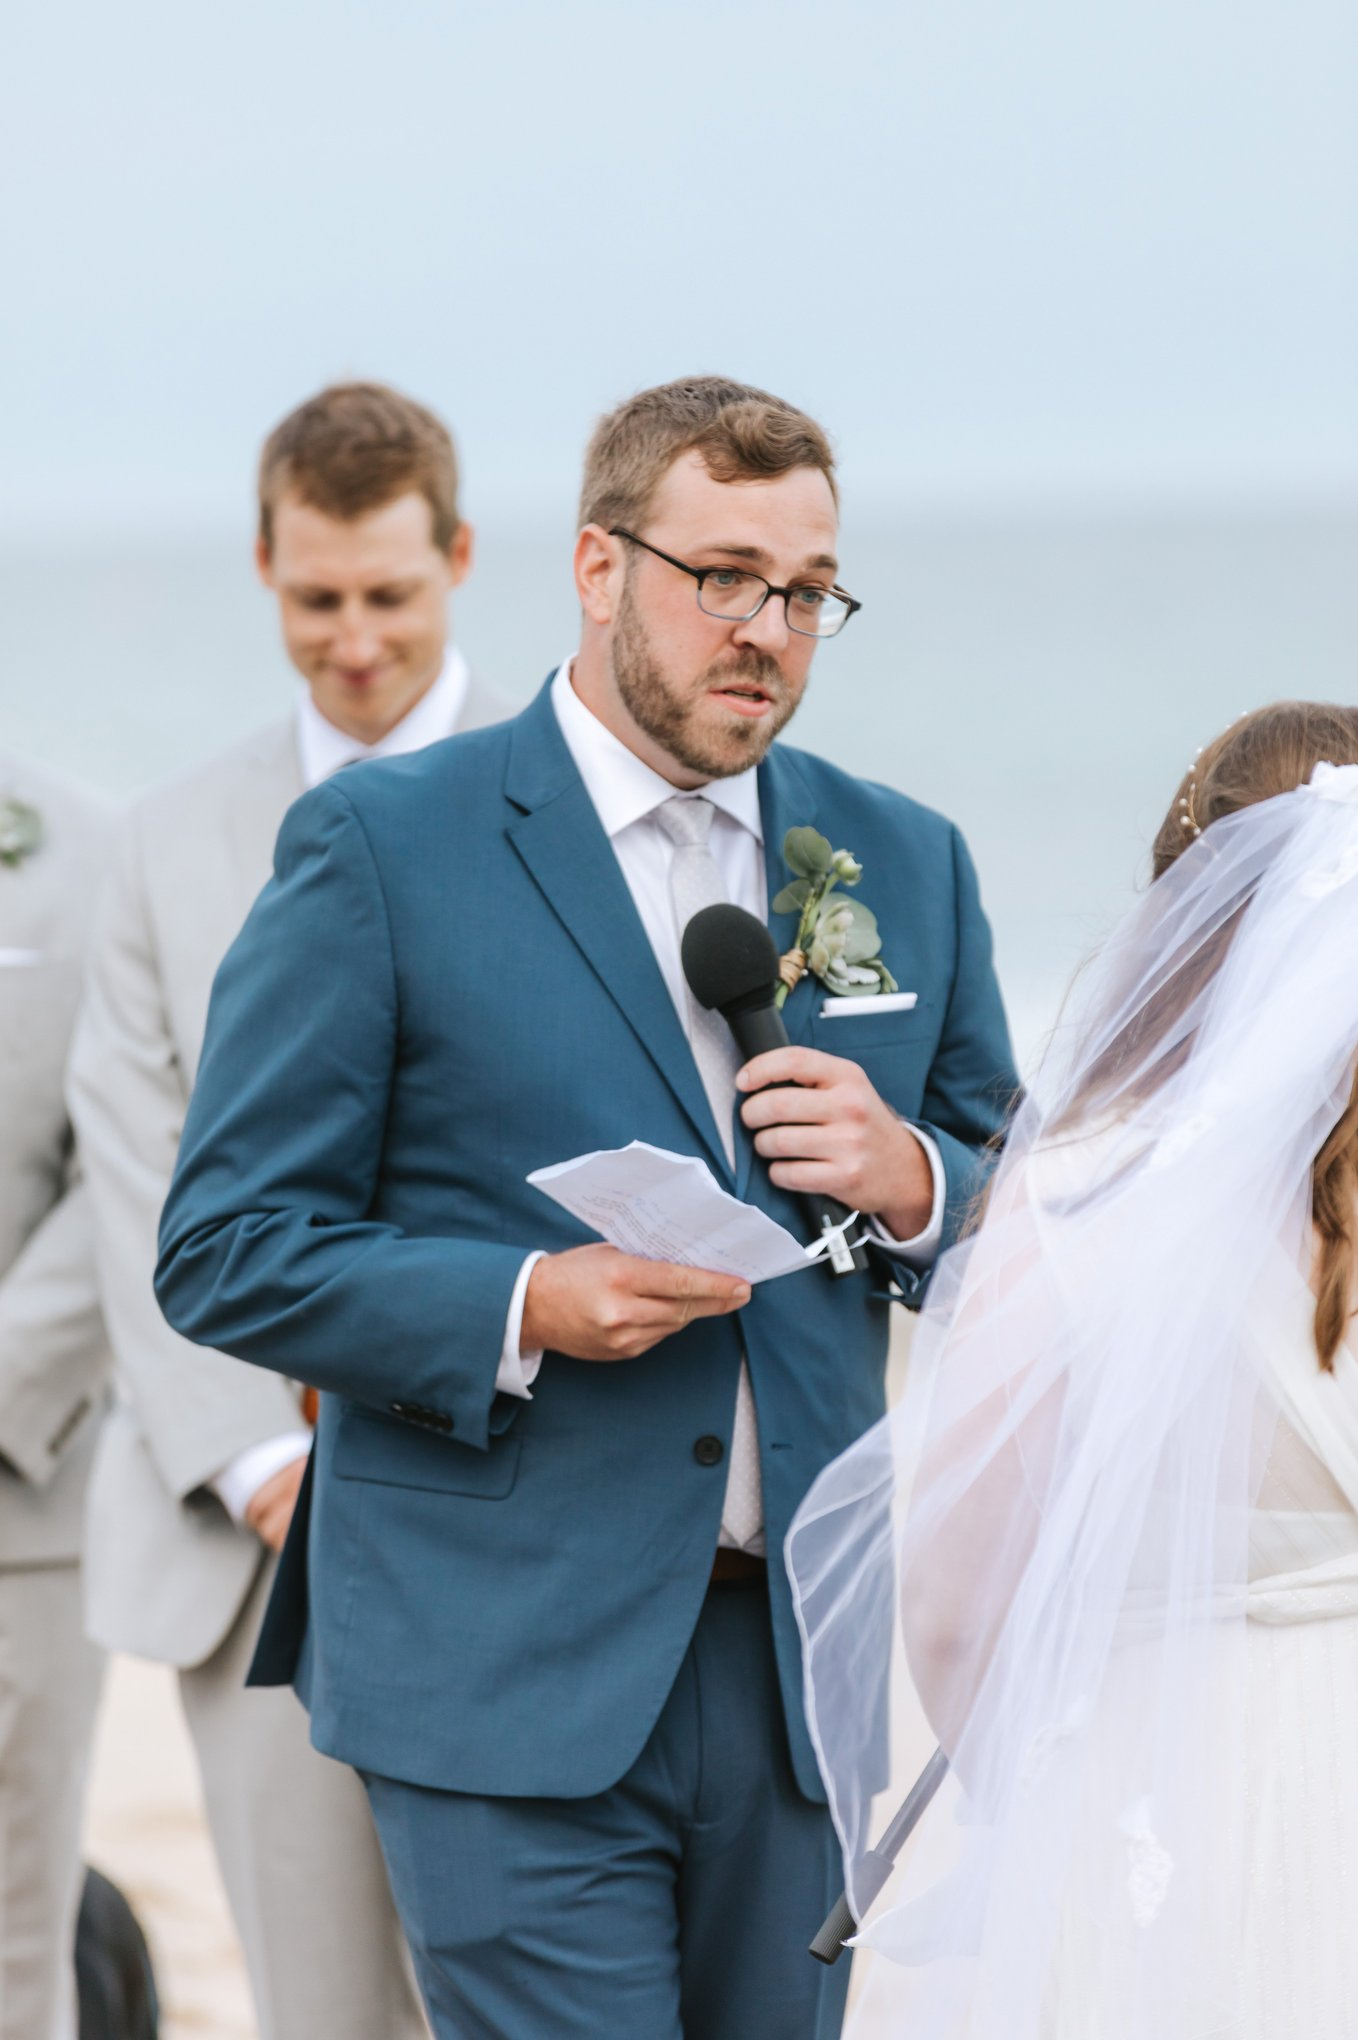 Newport-Wedding-Backyard-Photographer-21.jpg